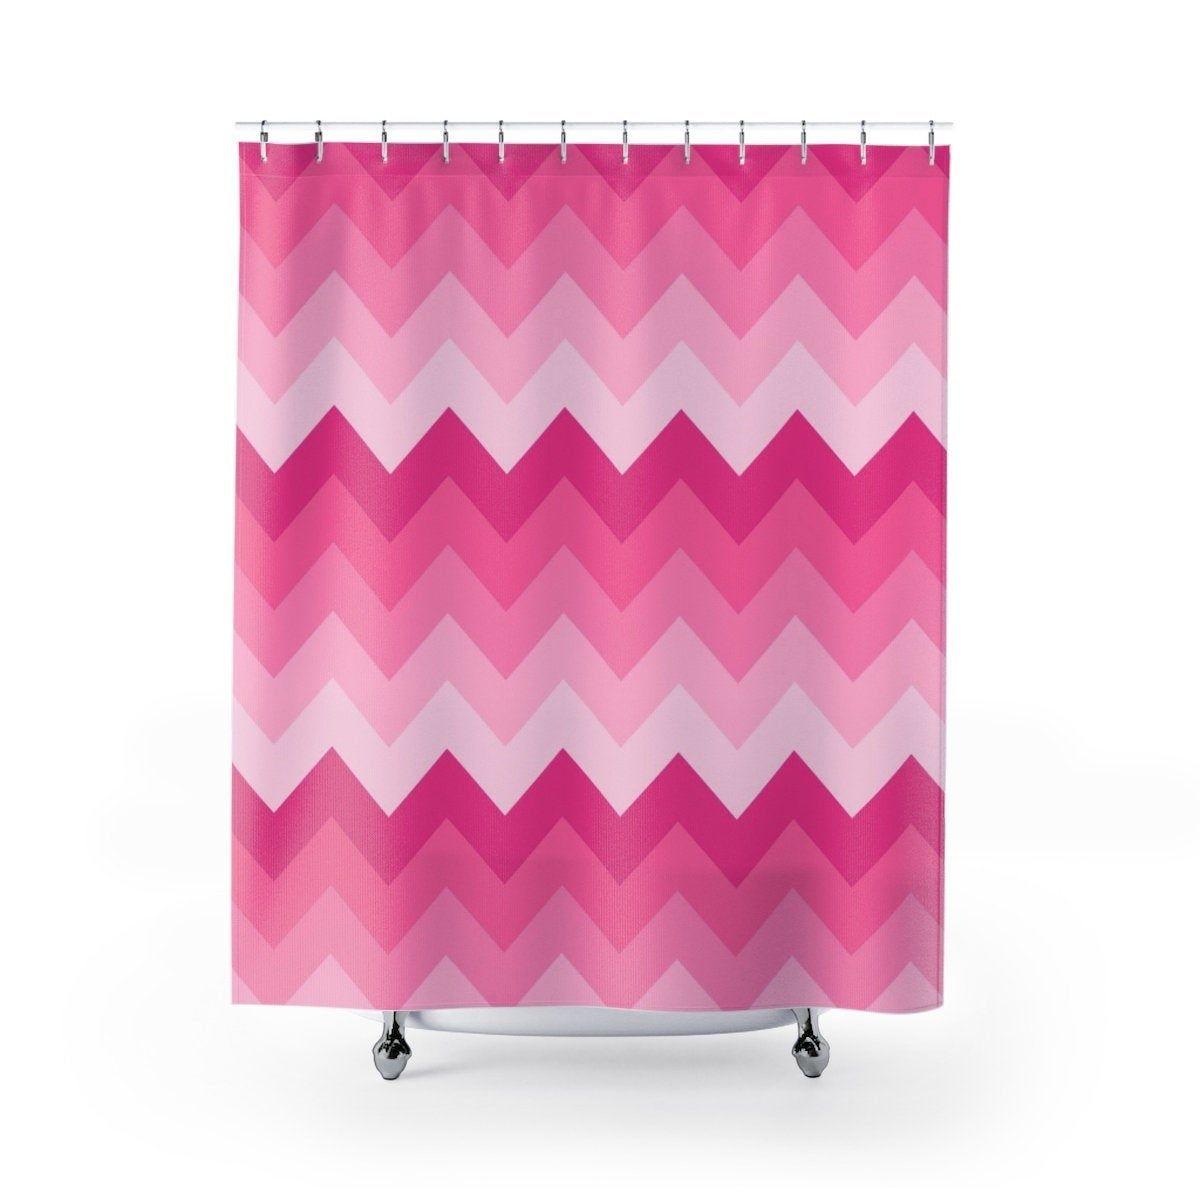 Hot Pink Chevron Shower Curtain Girls Bathroom Decor Etsy In